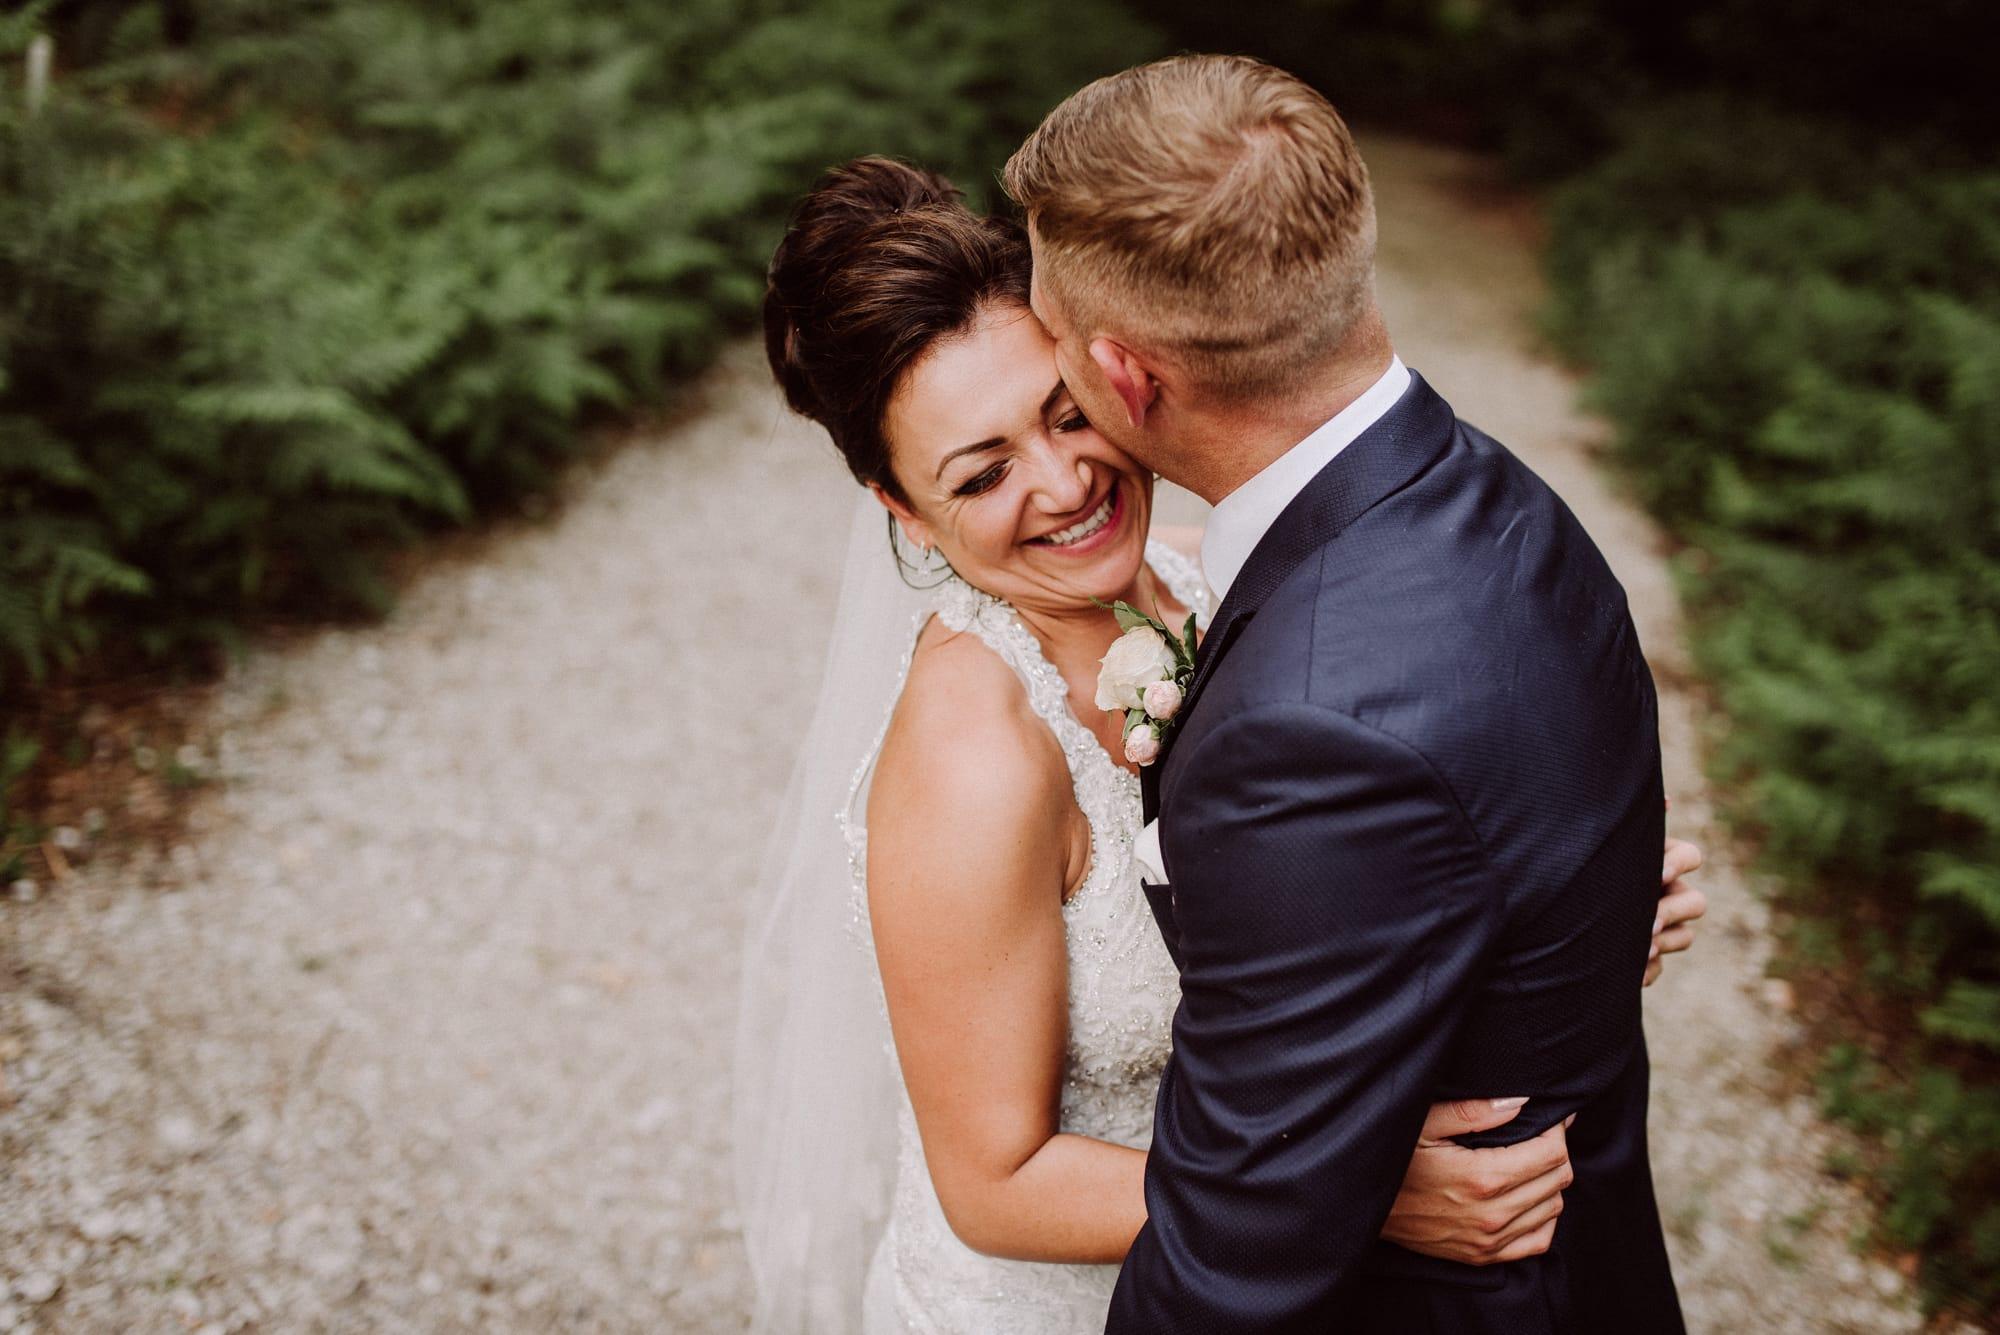 Bride and Groom Couple Portraits Tianna J-Williams Wedding Photographer West Midlands